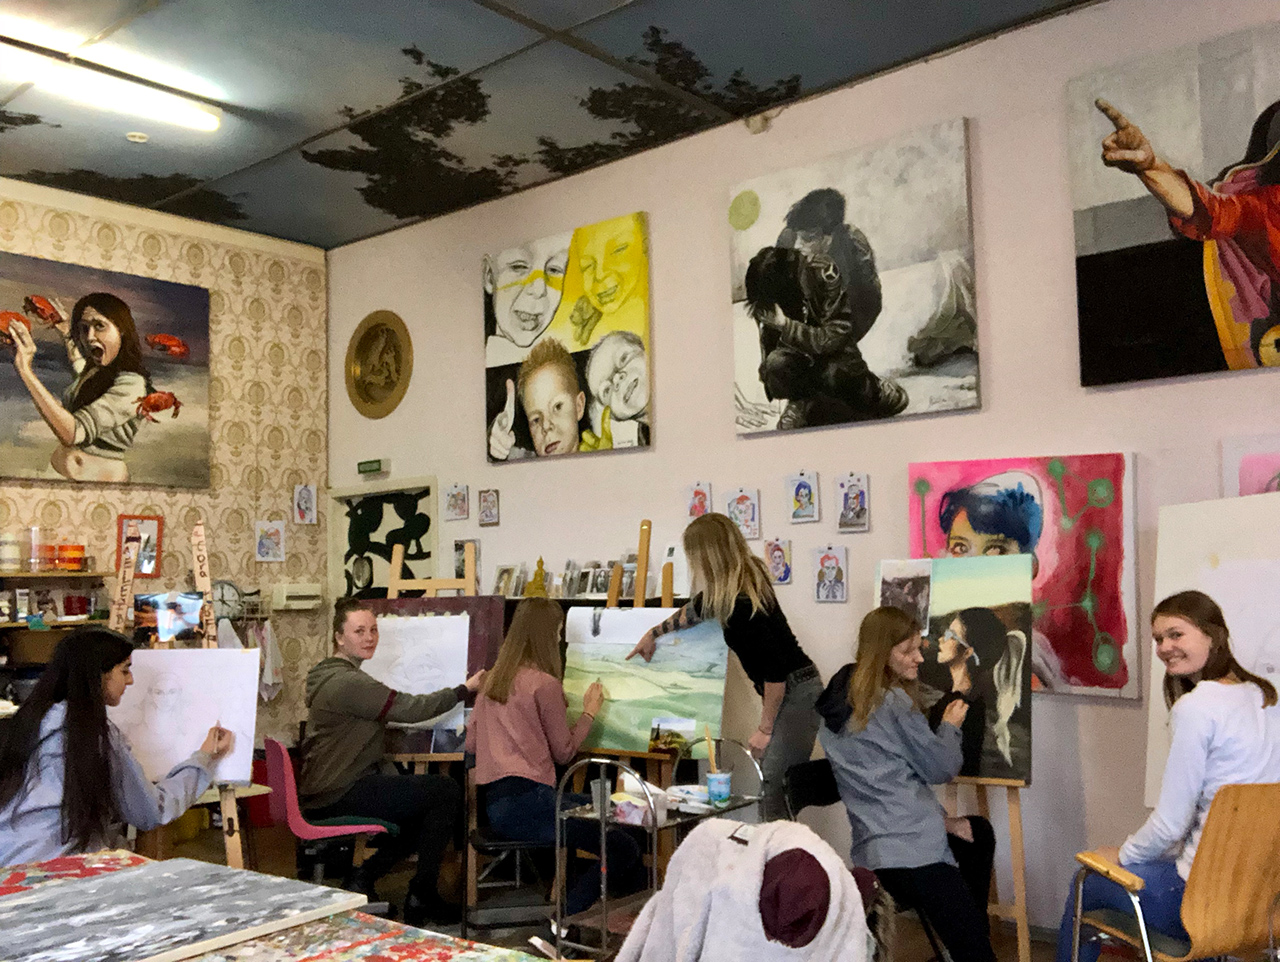 ccr-atelier_claudia-cremer_bodenmalerei-10